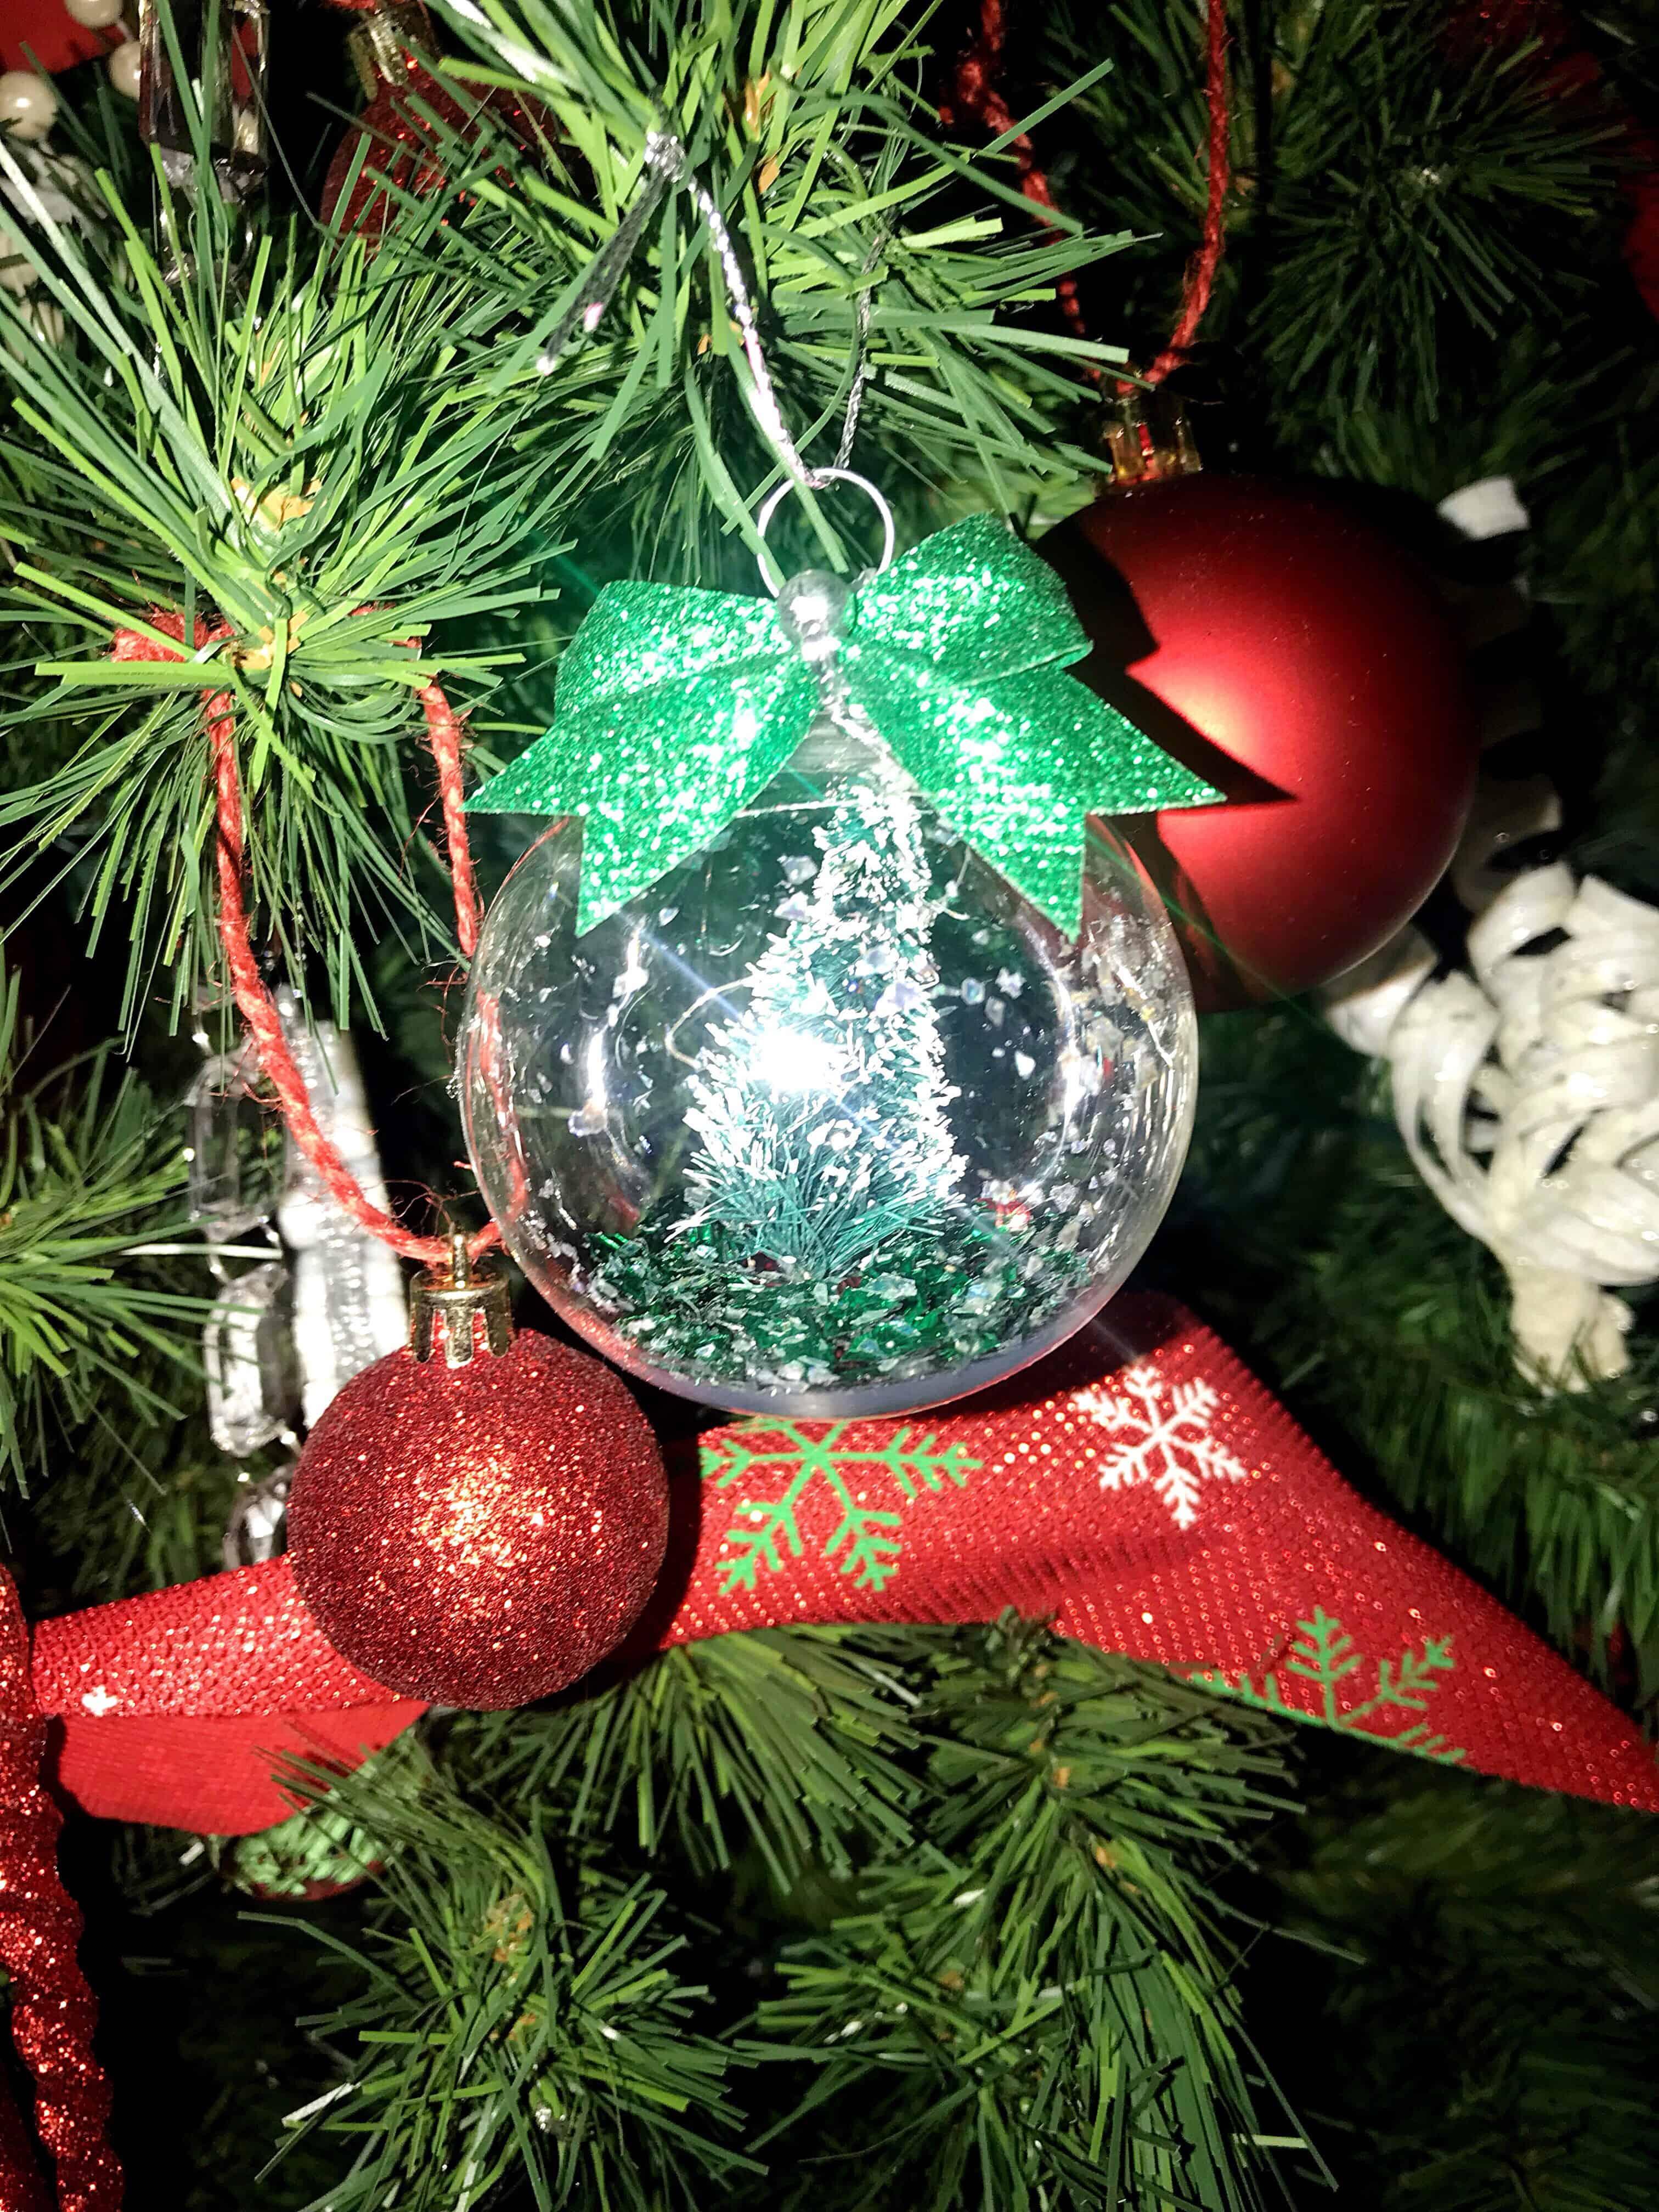 DIY Christmas Decor - DIY Christmas Crafts - Christmas Crafts for Kids - Easy Christmas Crafts - DIY Christmas Decorations - Christmas Projects - Christmas Kid Activities - Farmhouse Decor - Farmhouse Christmas Home Decor - DIY Christmas Ornaments - Easy Ornaments To Make